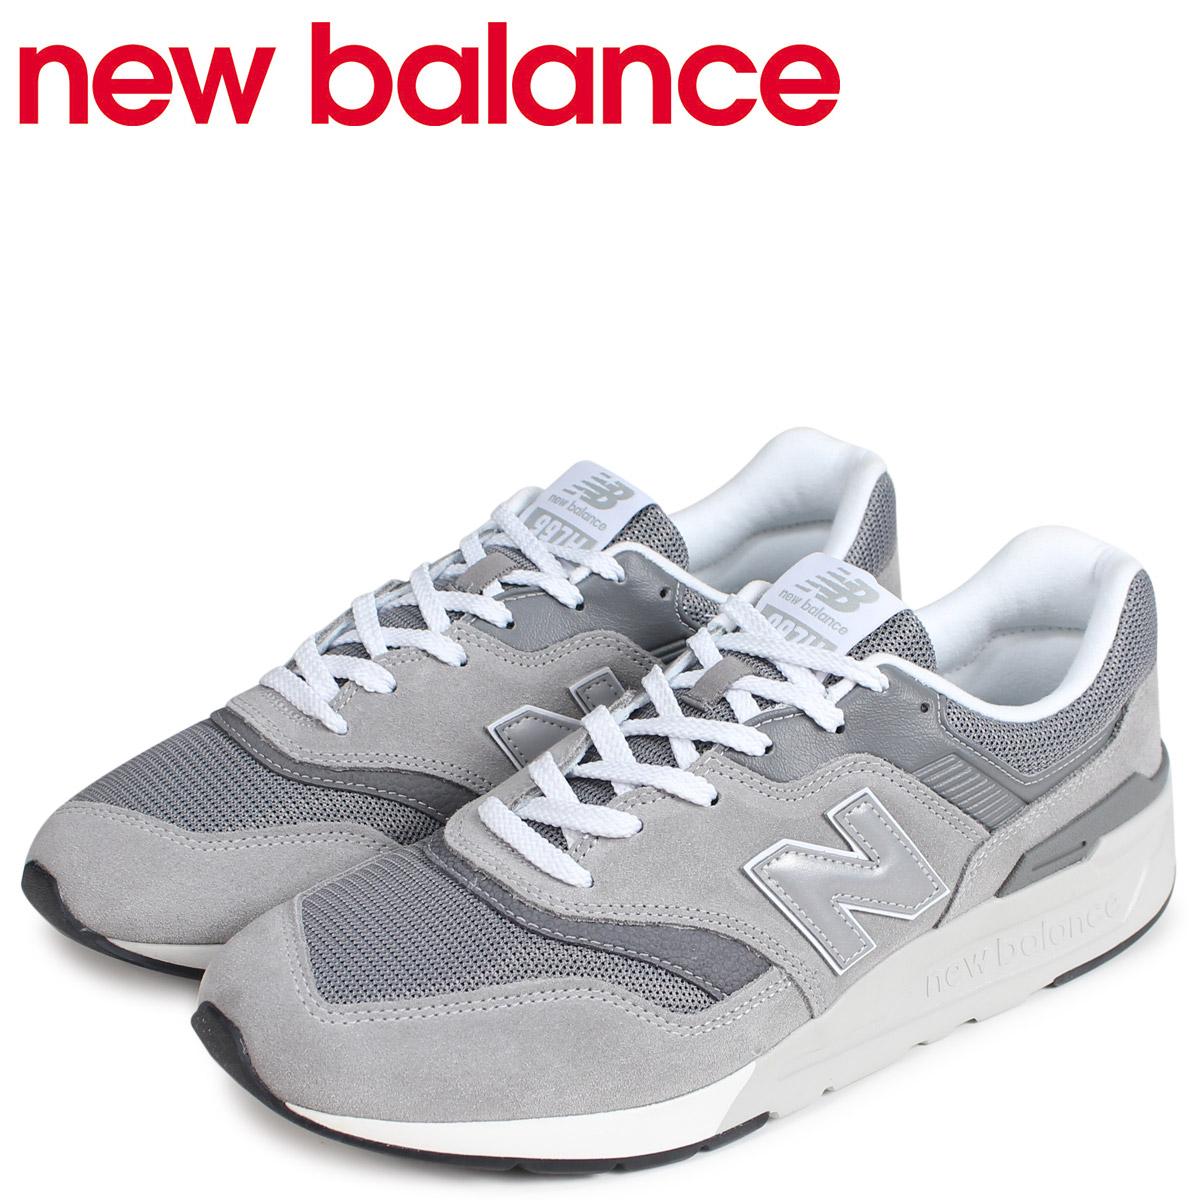 new balance 997 cm997hca